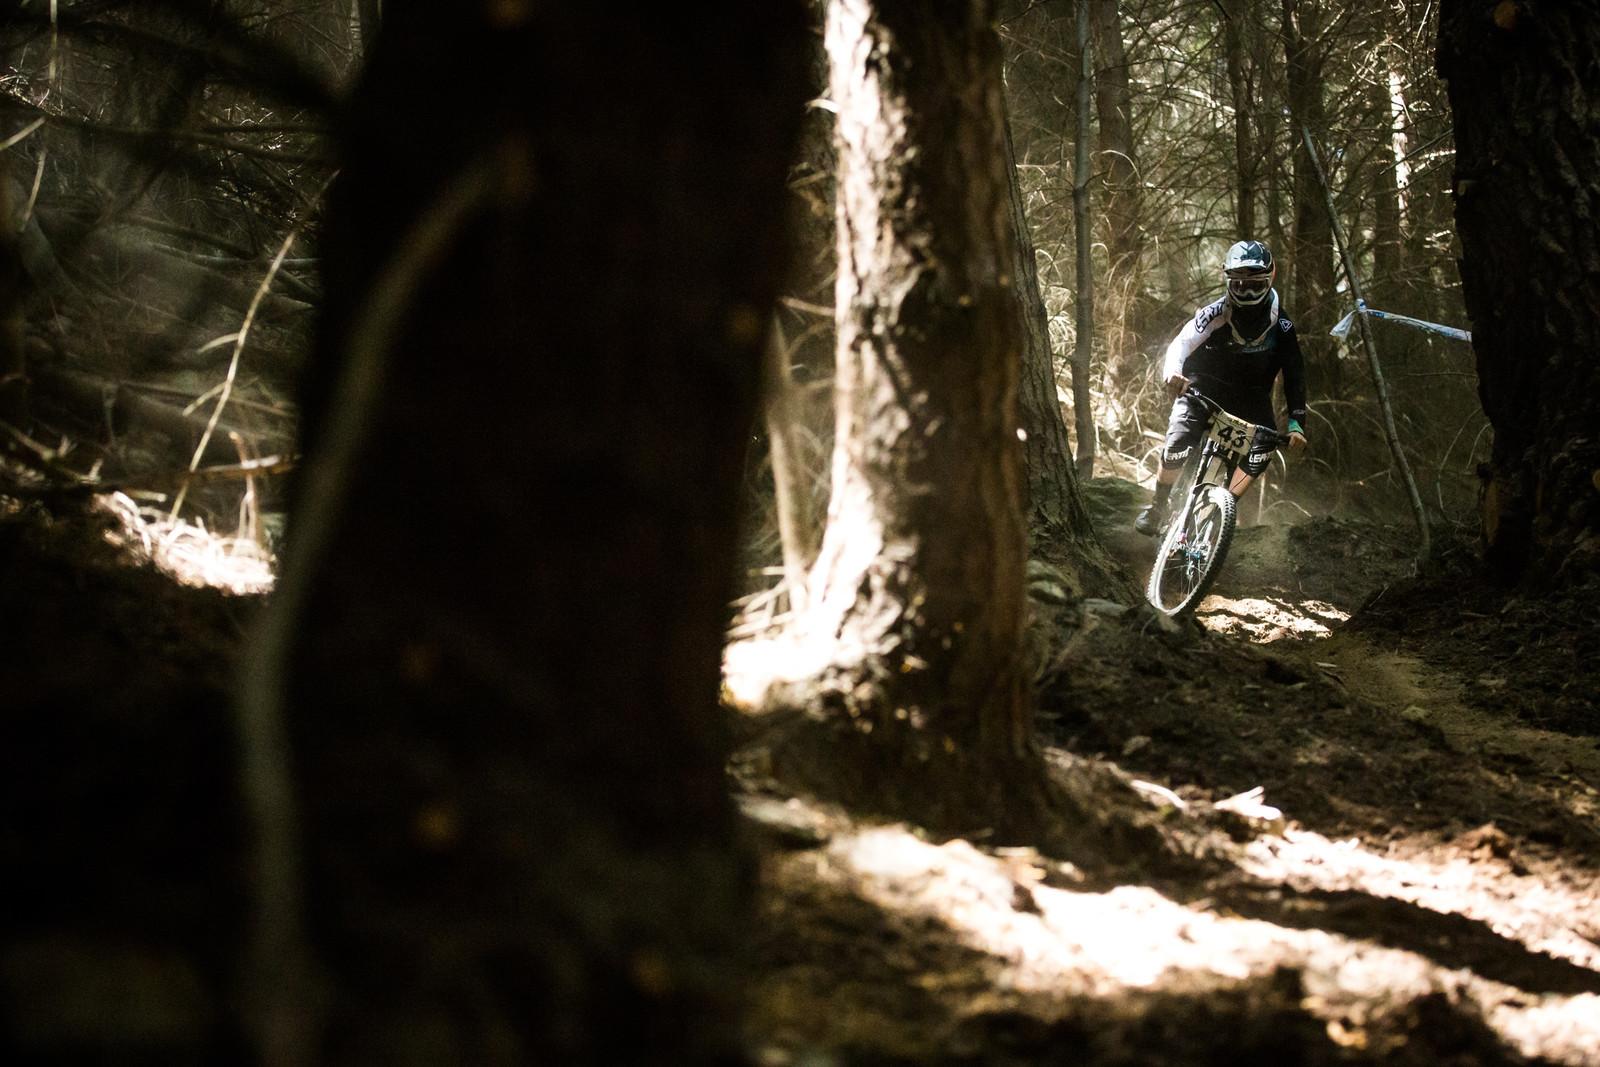 Simon Read - Homegrown NZ Downhill - Vertigo Bikes Ride More DH Series Race 1 - Mountain Biking Pictures - Vital MTB